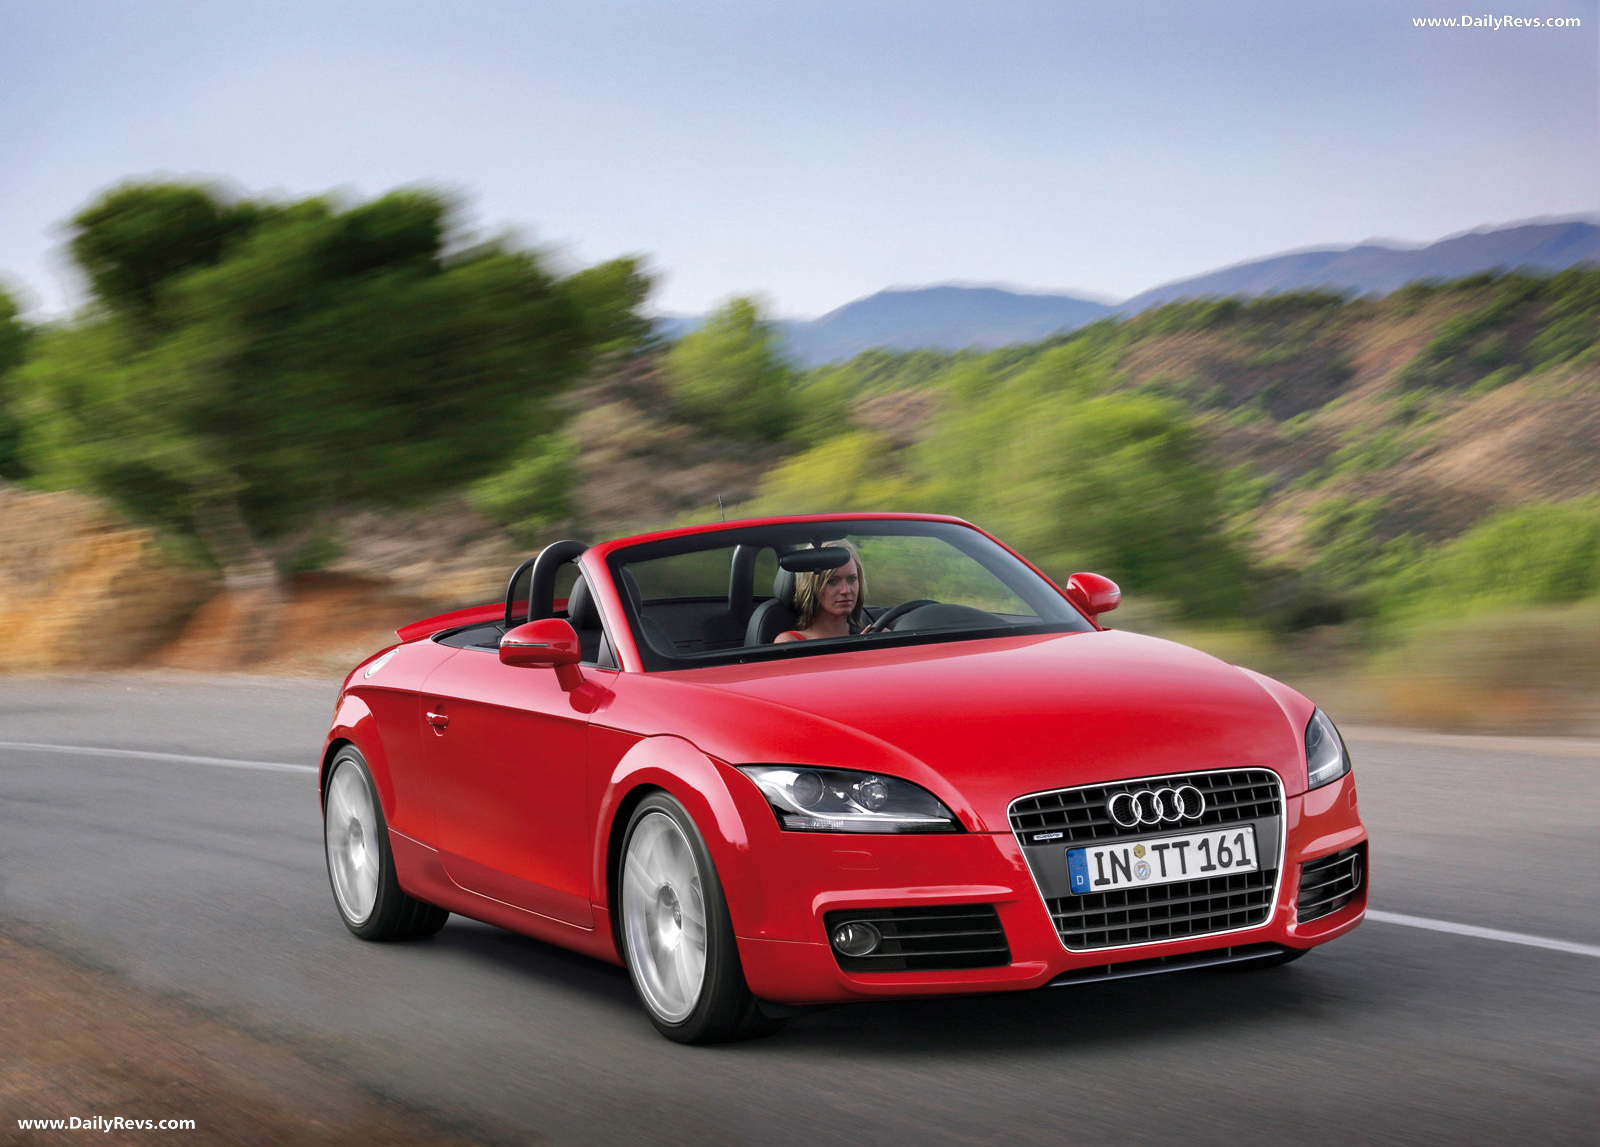 2007 Audi TT Roadster 2.0 TFSI - HD Pictures, Videos ...